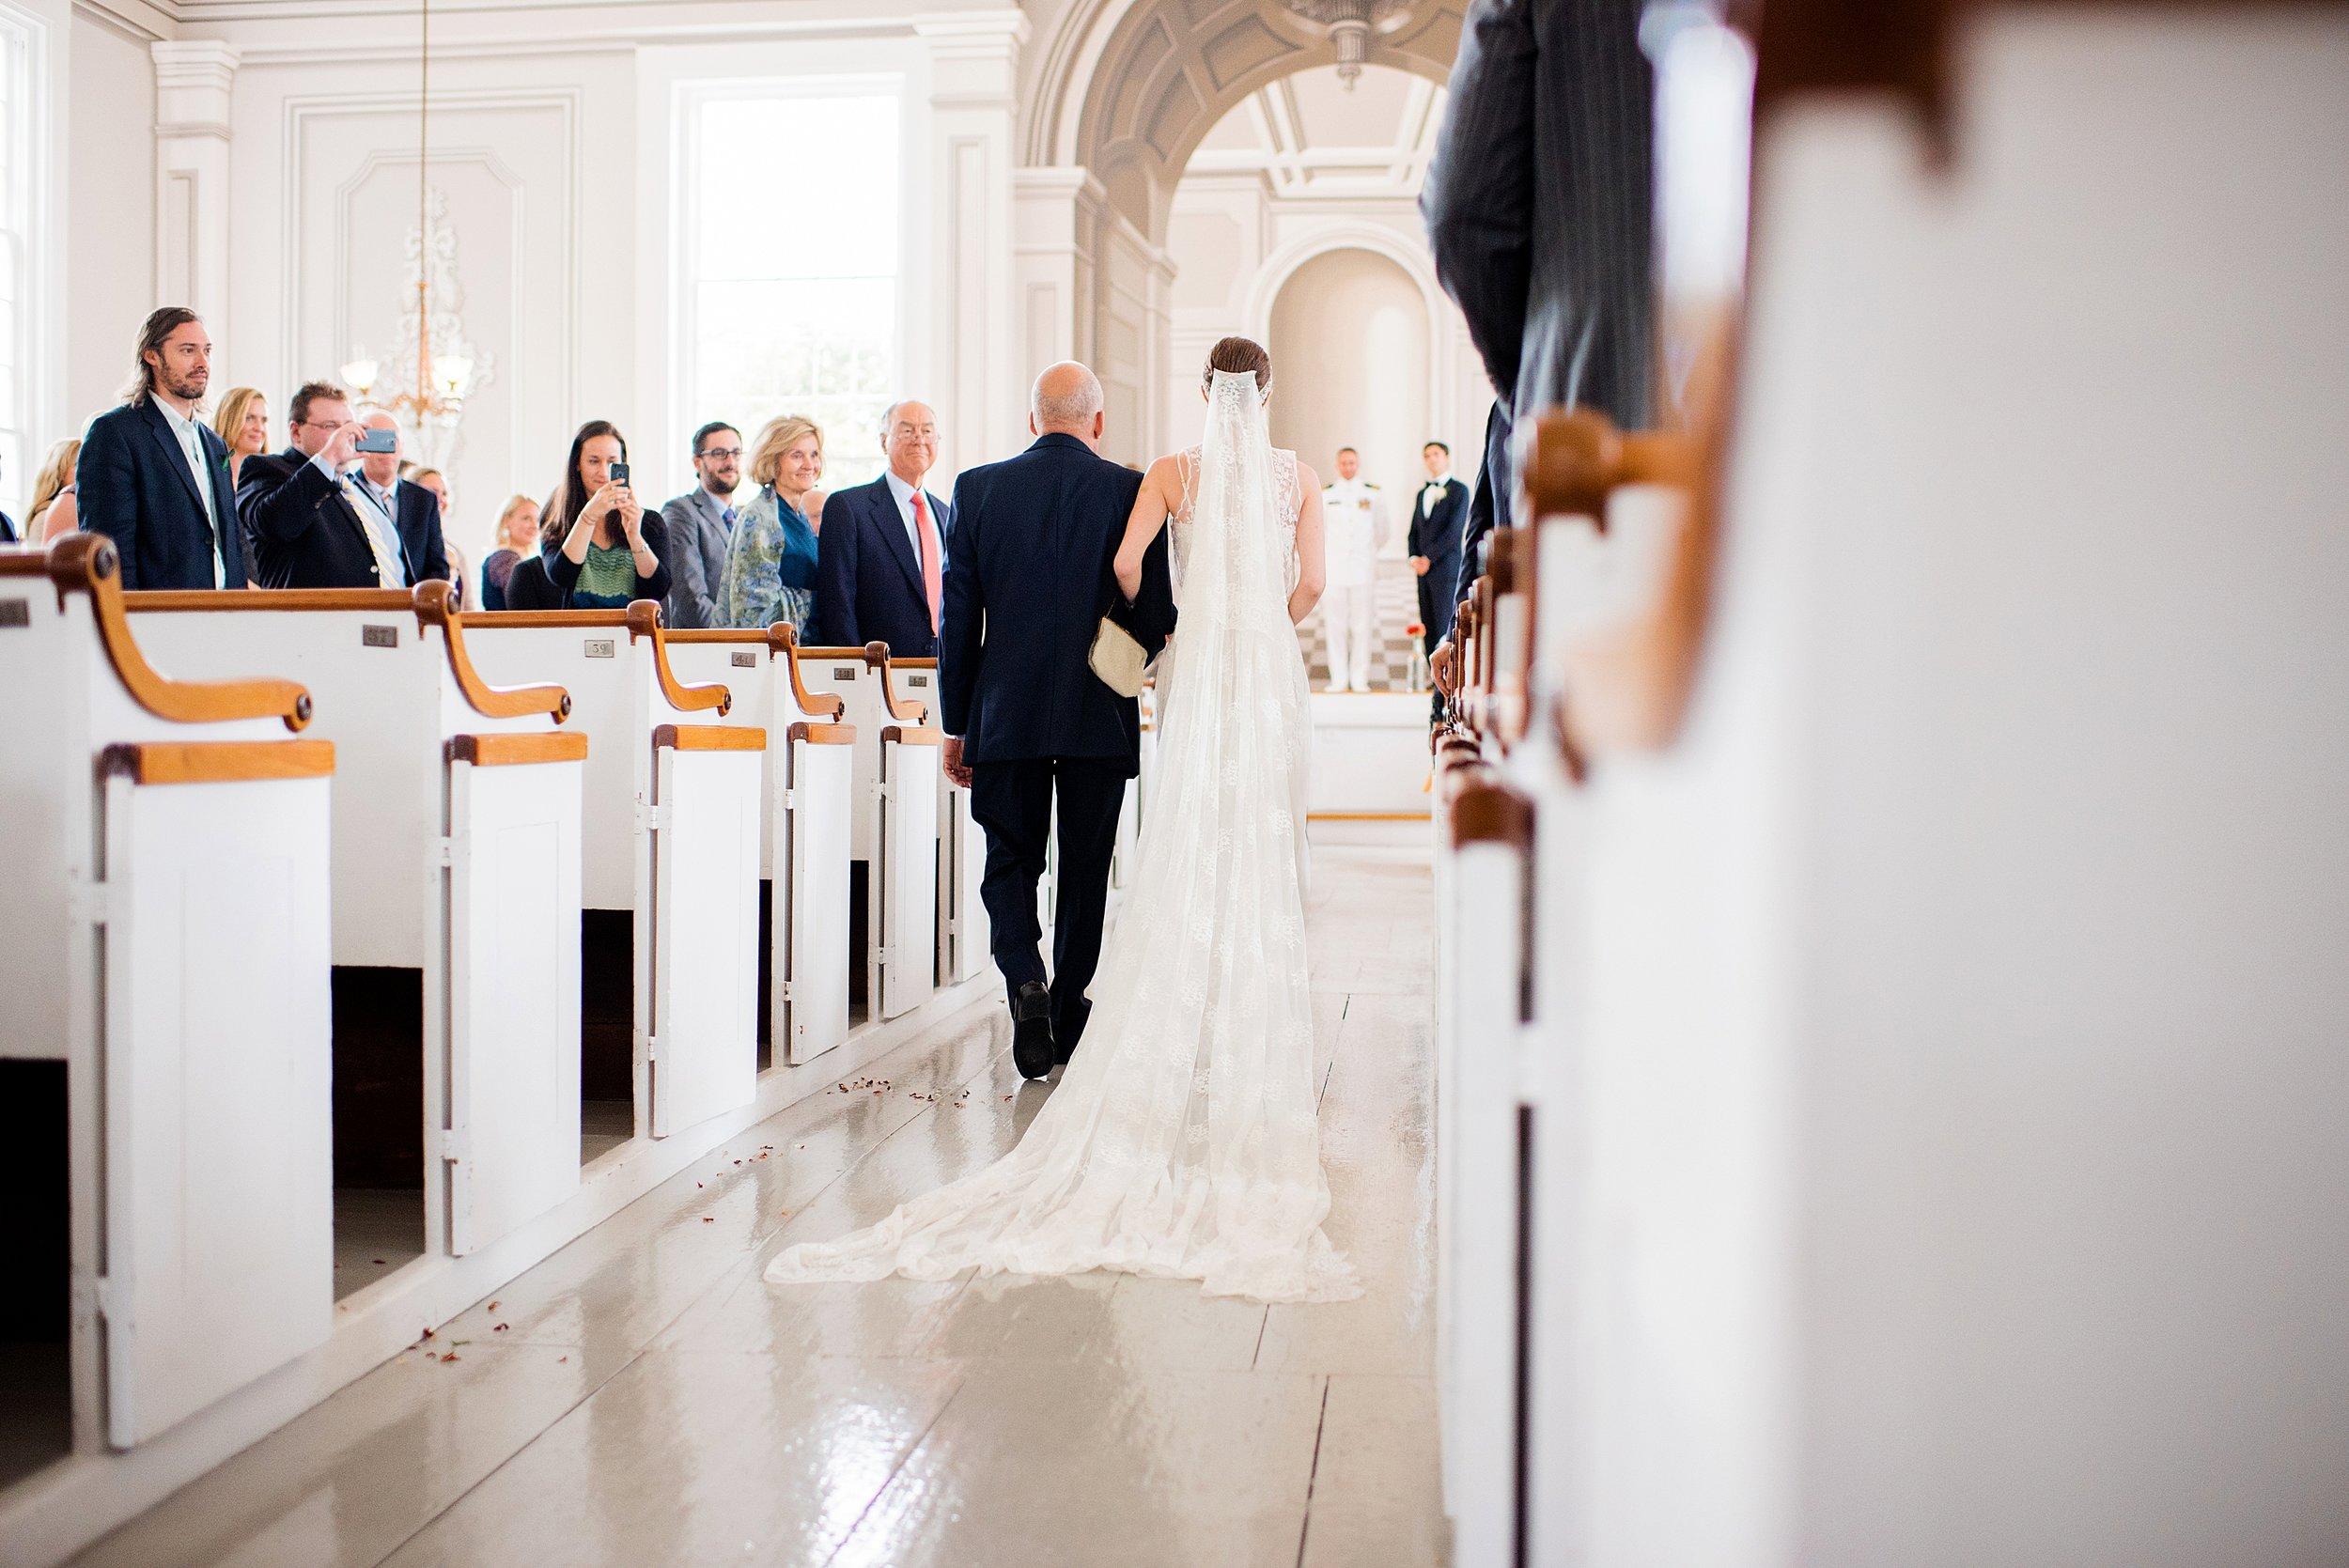 027 marthas vineyard wedding photographer todd danforth photography.jpg